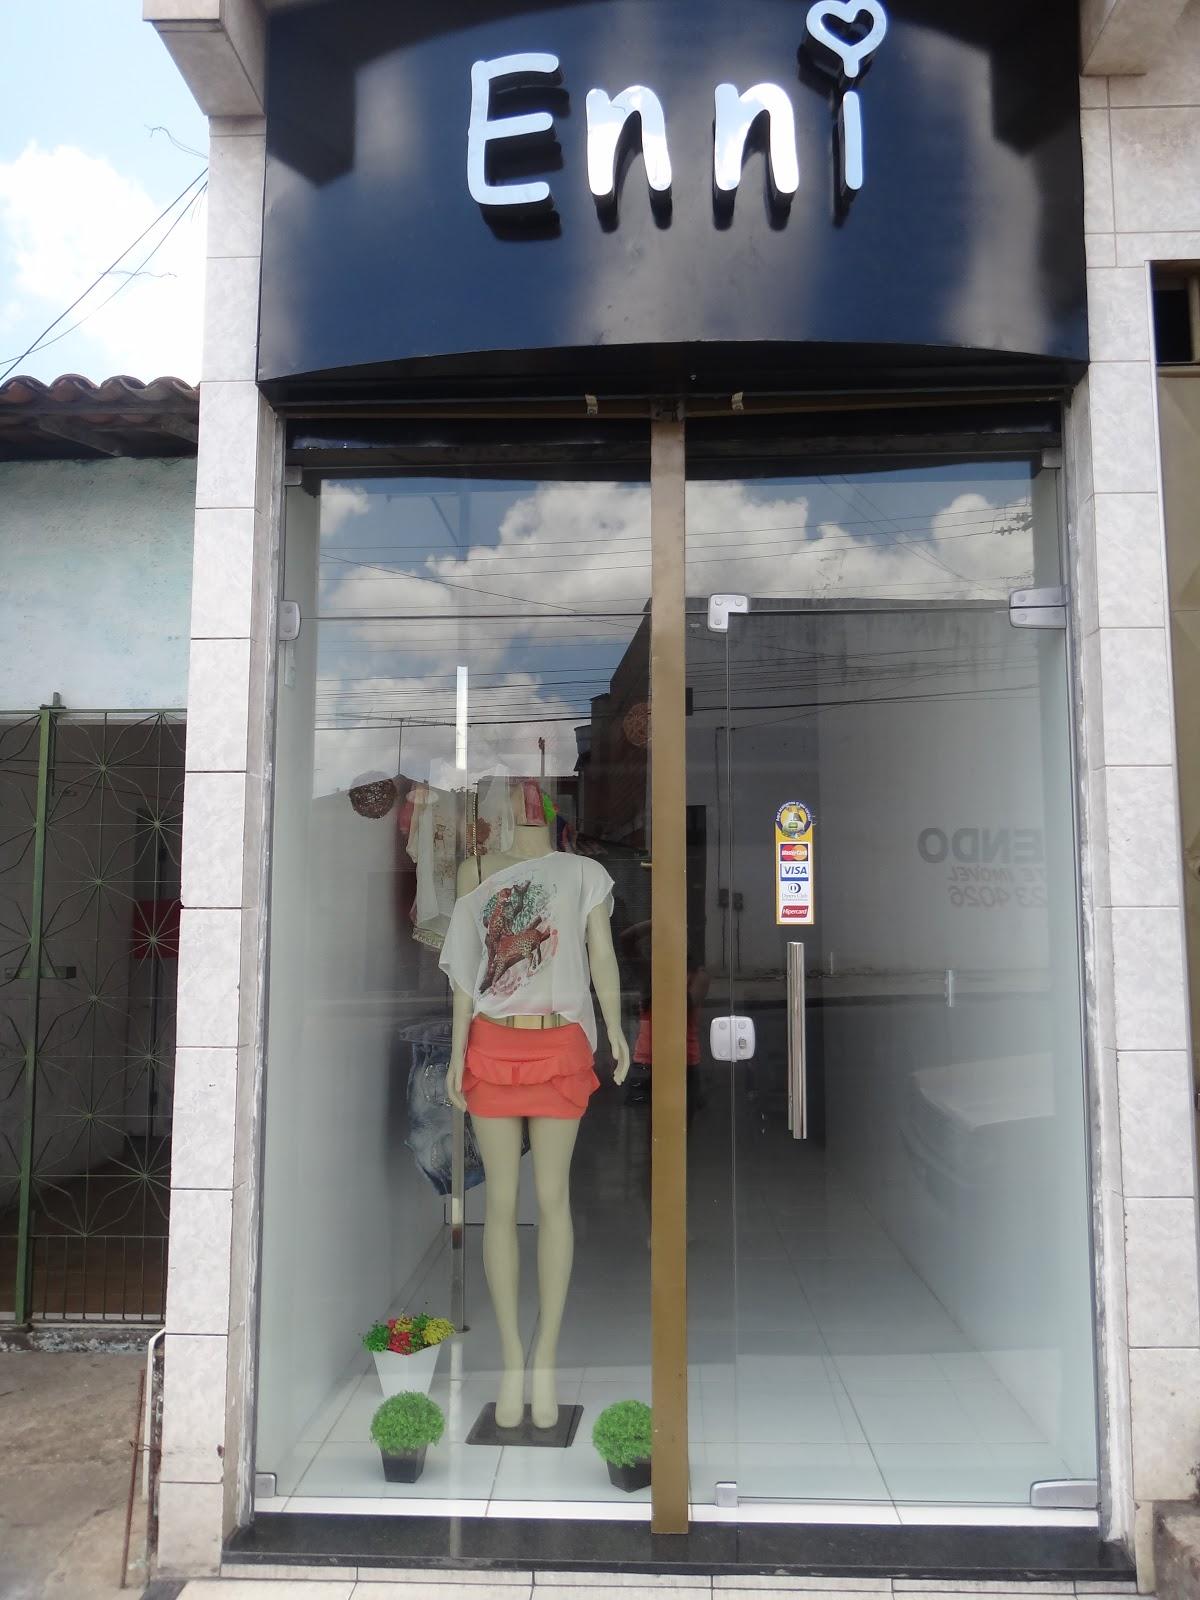 Suficiente enni, roupas e acessórios.: Fachada da loja . PB47